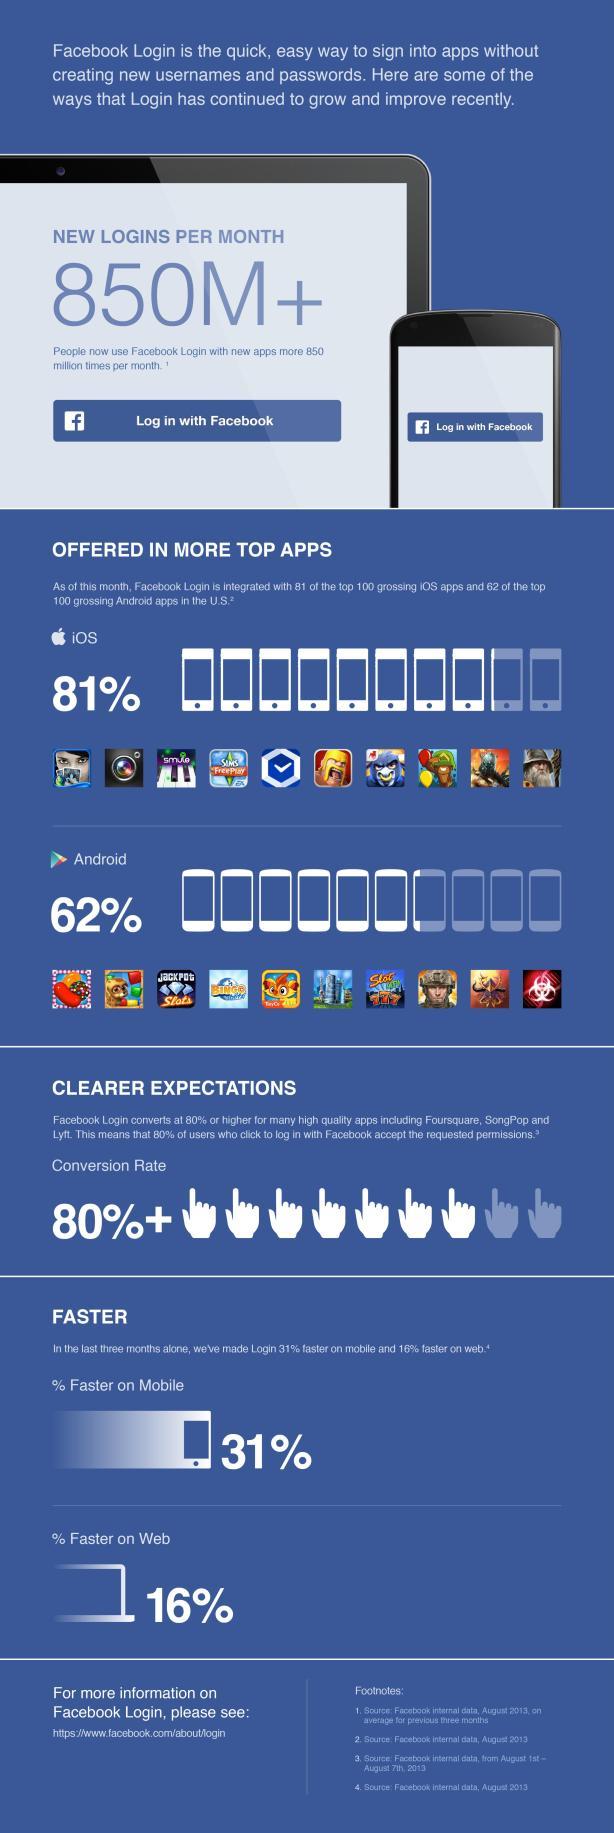 Facebook Login infographic